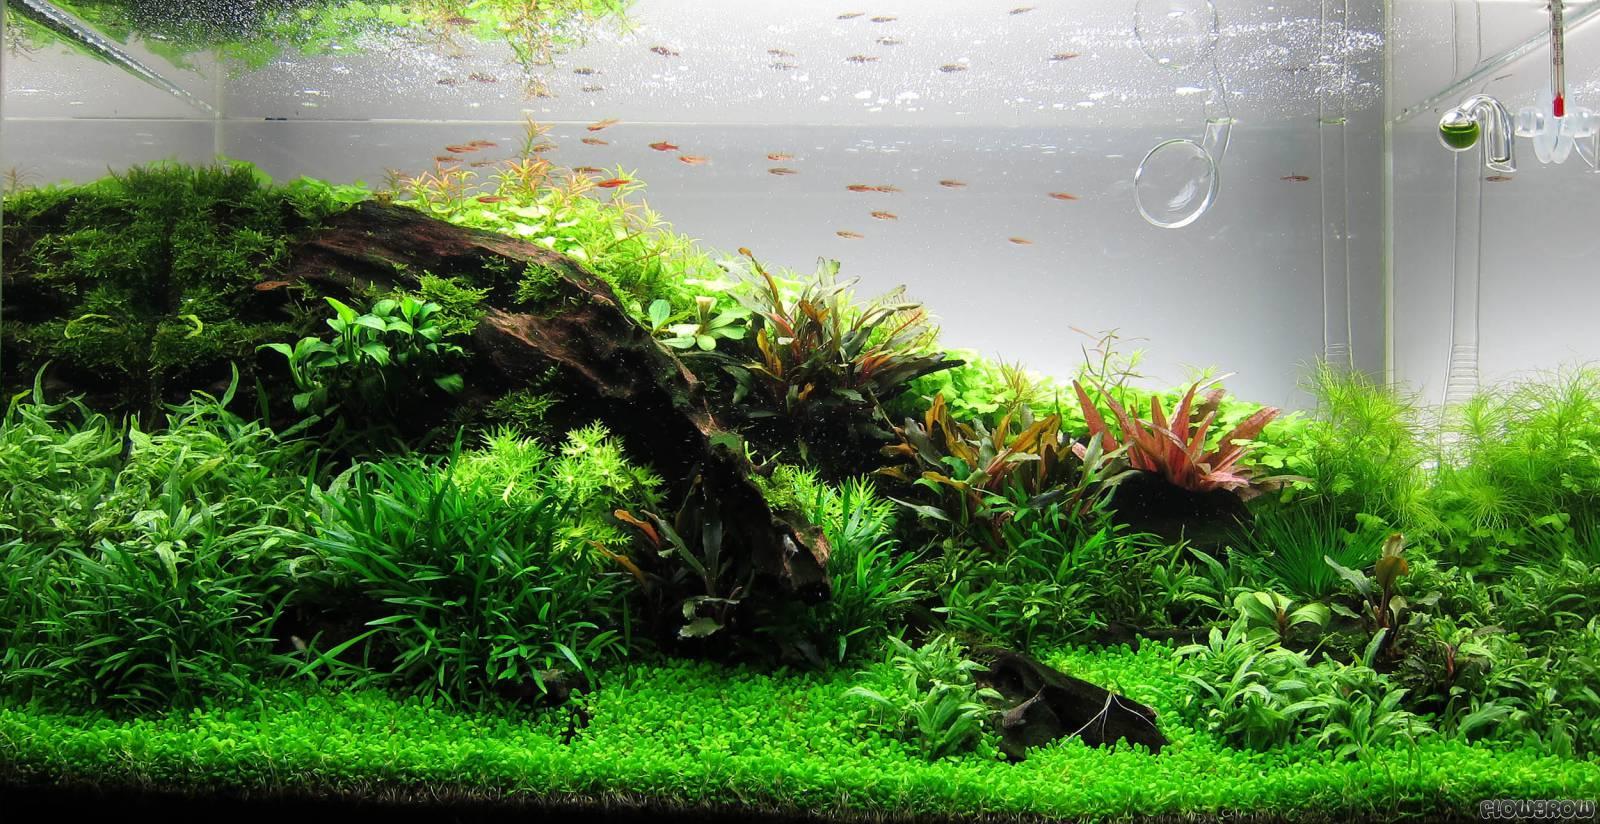 Elatine Hydropiper Eight Stamen Waterwort Flowgrow Aquatic Plant Database